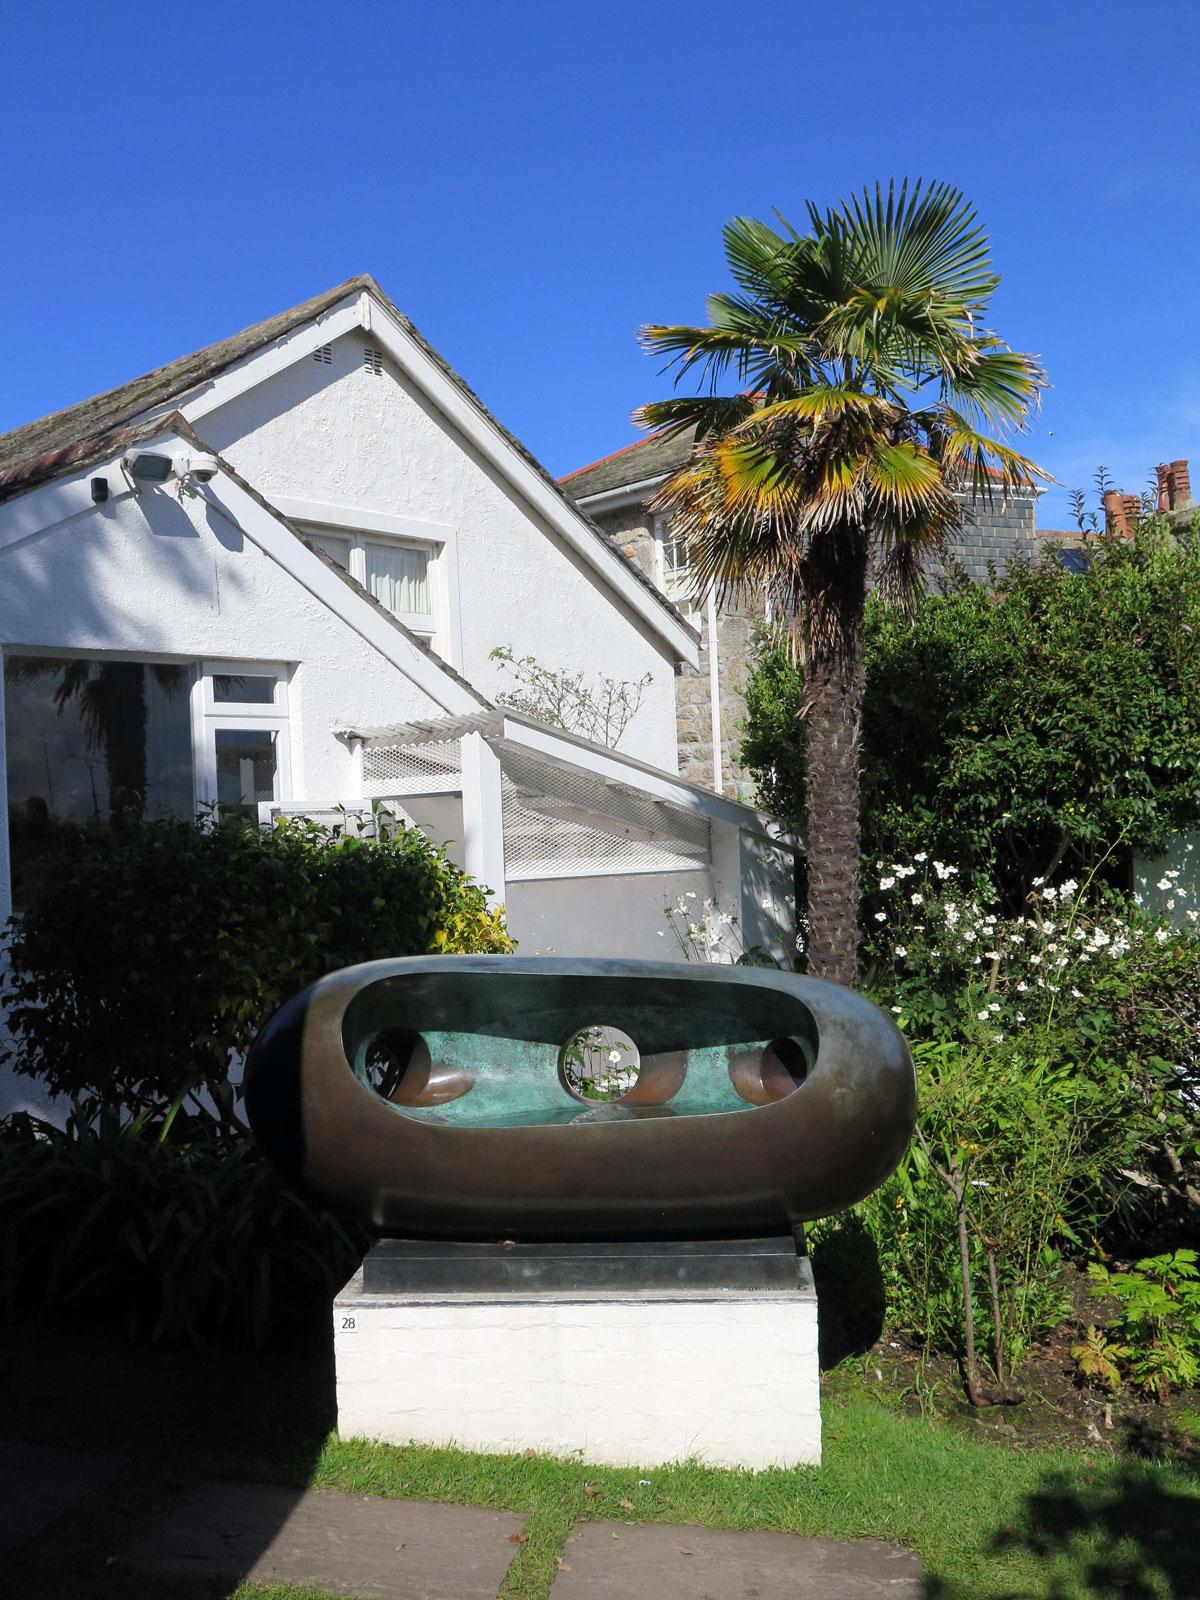 The Garden - 'River Form' Sculpture (1965)